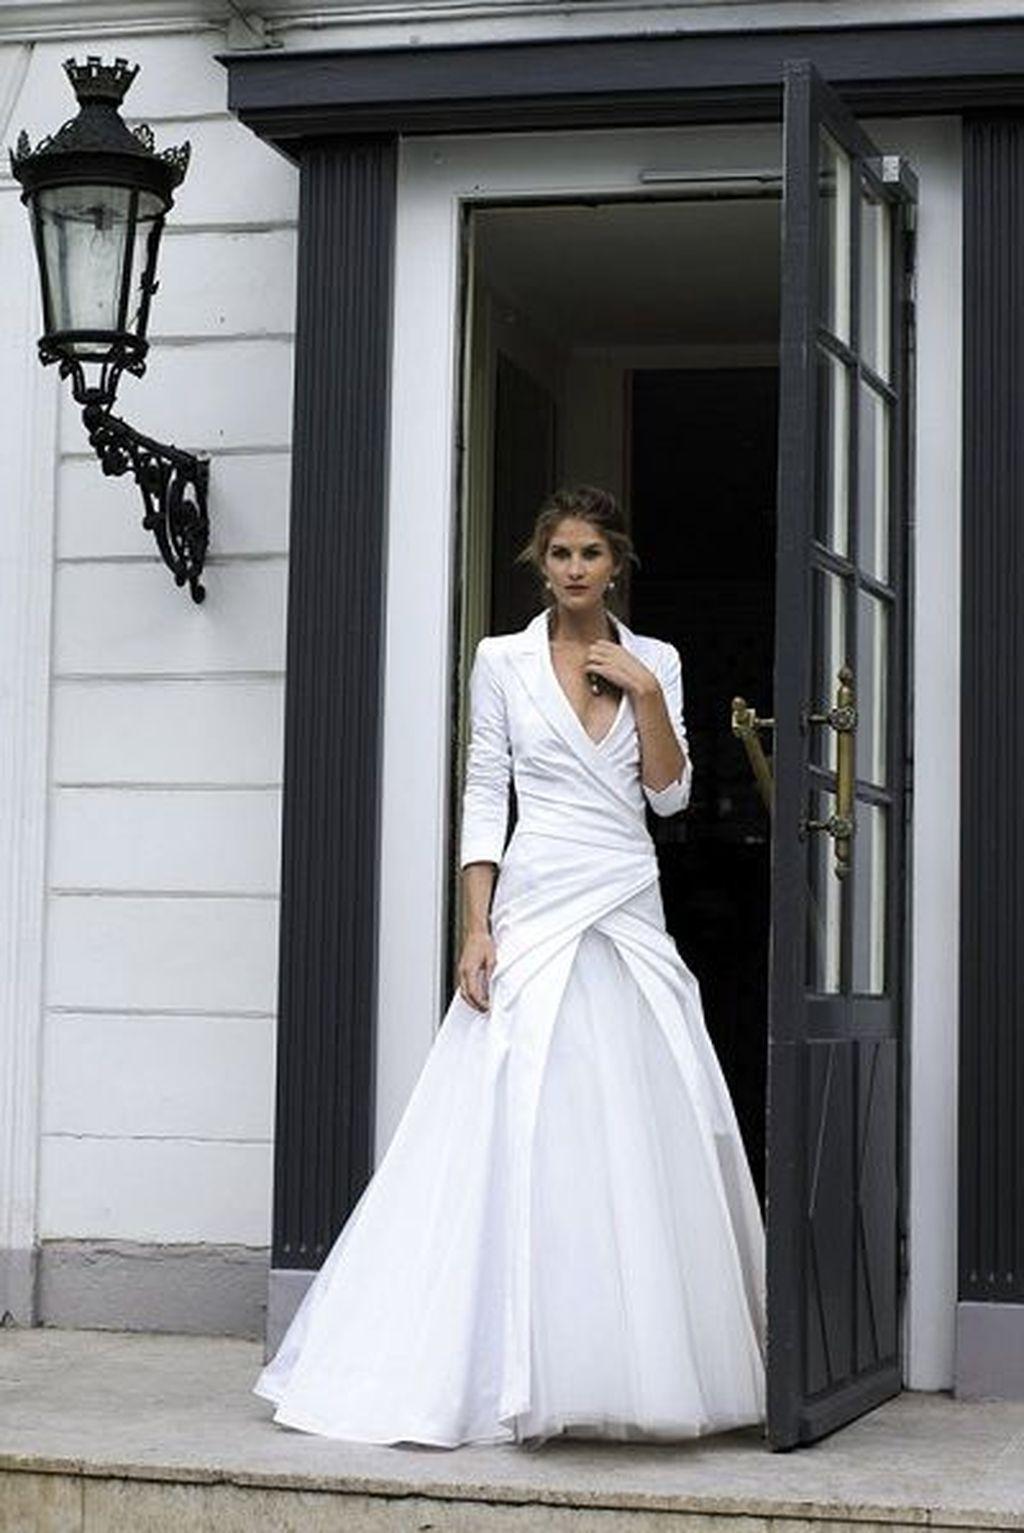 50 Elegant And Vintage Winter Wedding Dress Ideas Wedding Dresses Older Bride Cymbeline Wedding Dresses [ 1533 x 1024 Pixel ]